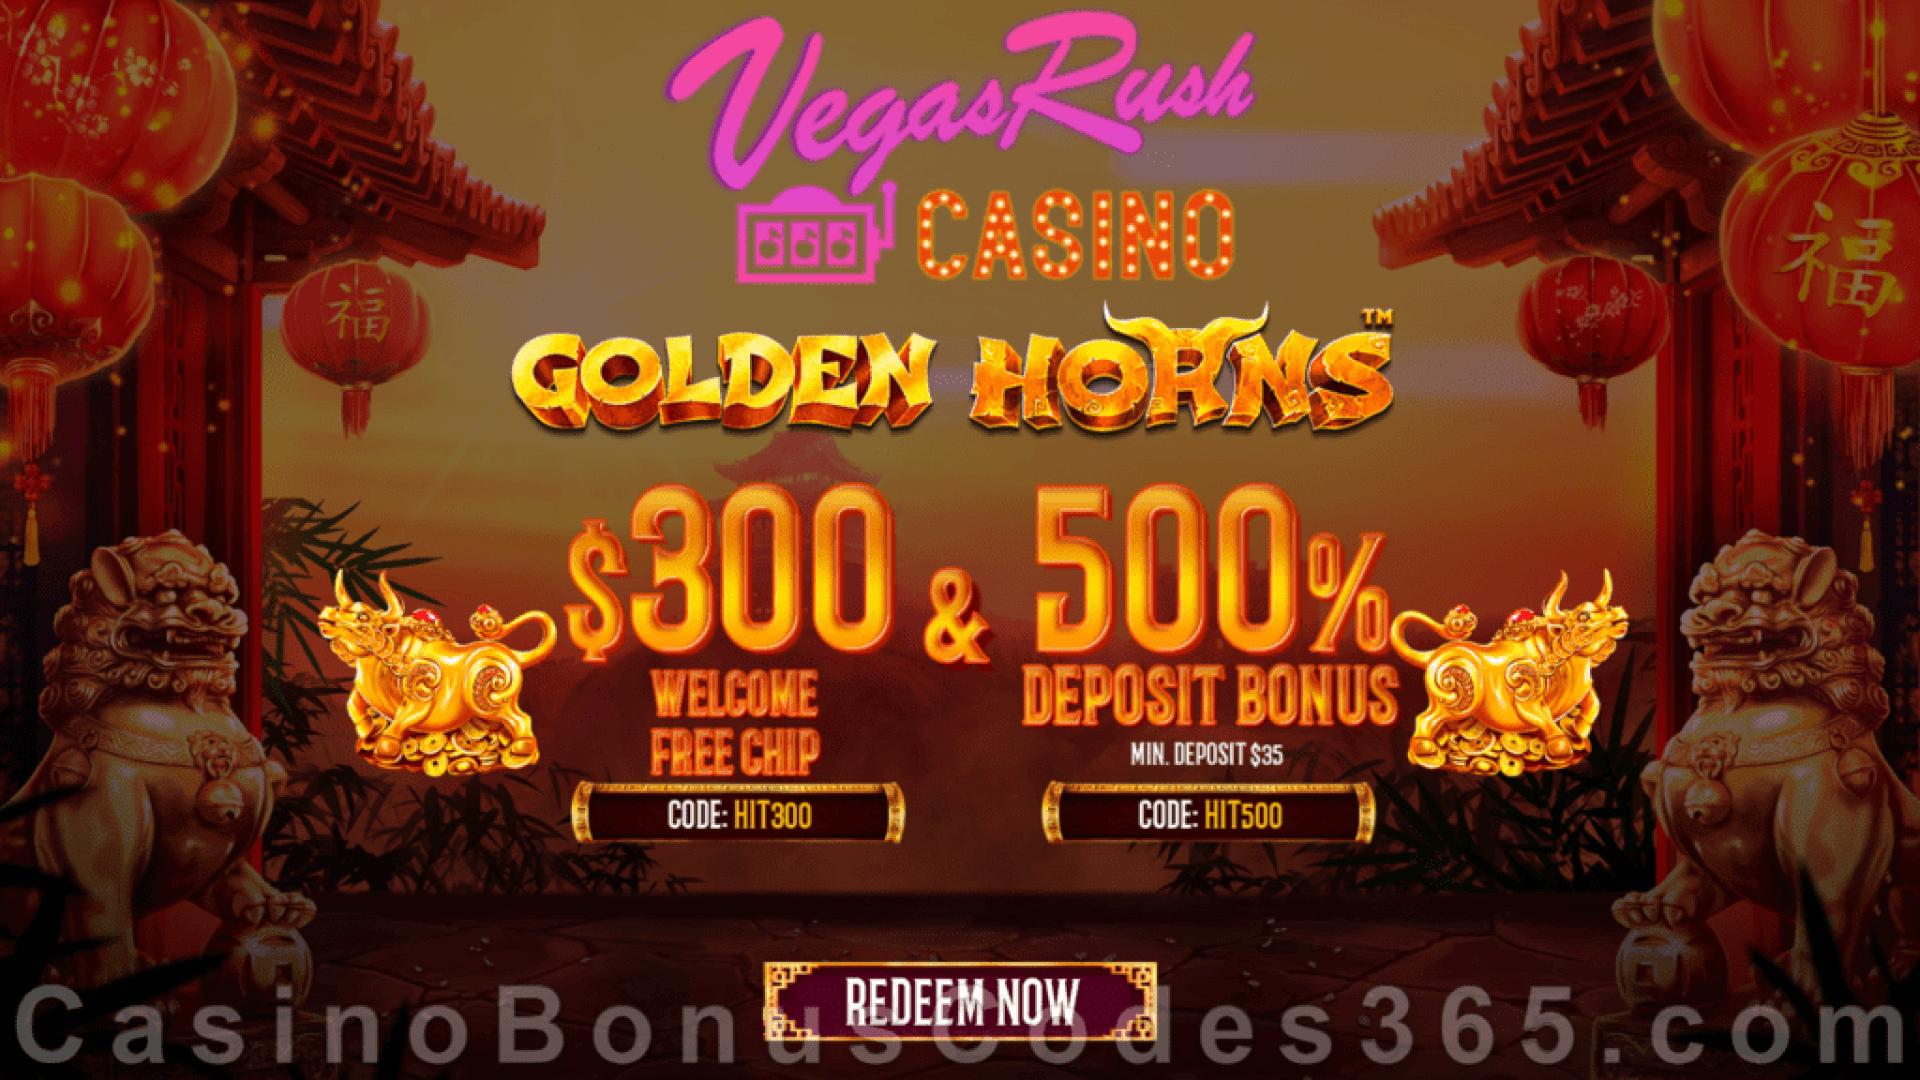 Vegas Rush Casino $100 No Deposit FREE Chip plus 500% Match Bonus Limited Time Offer